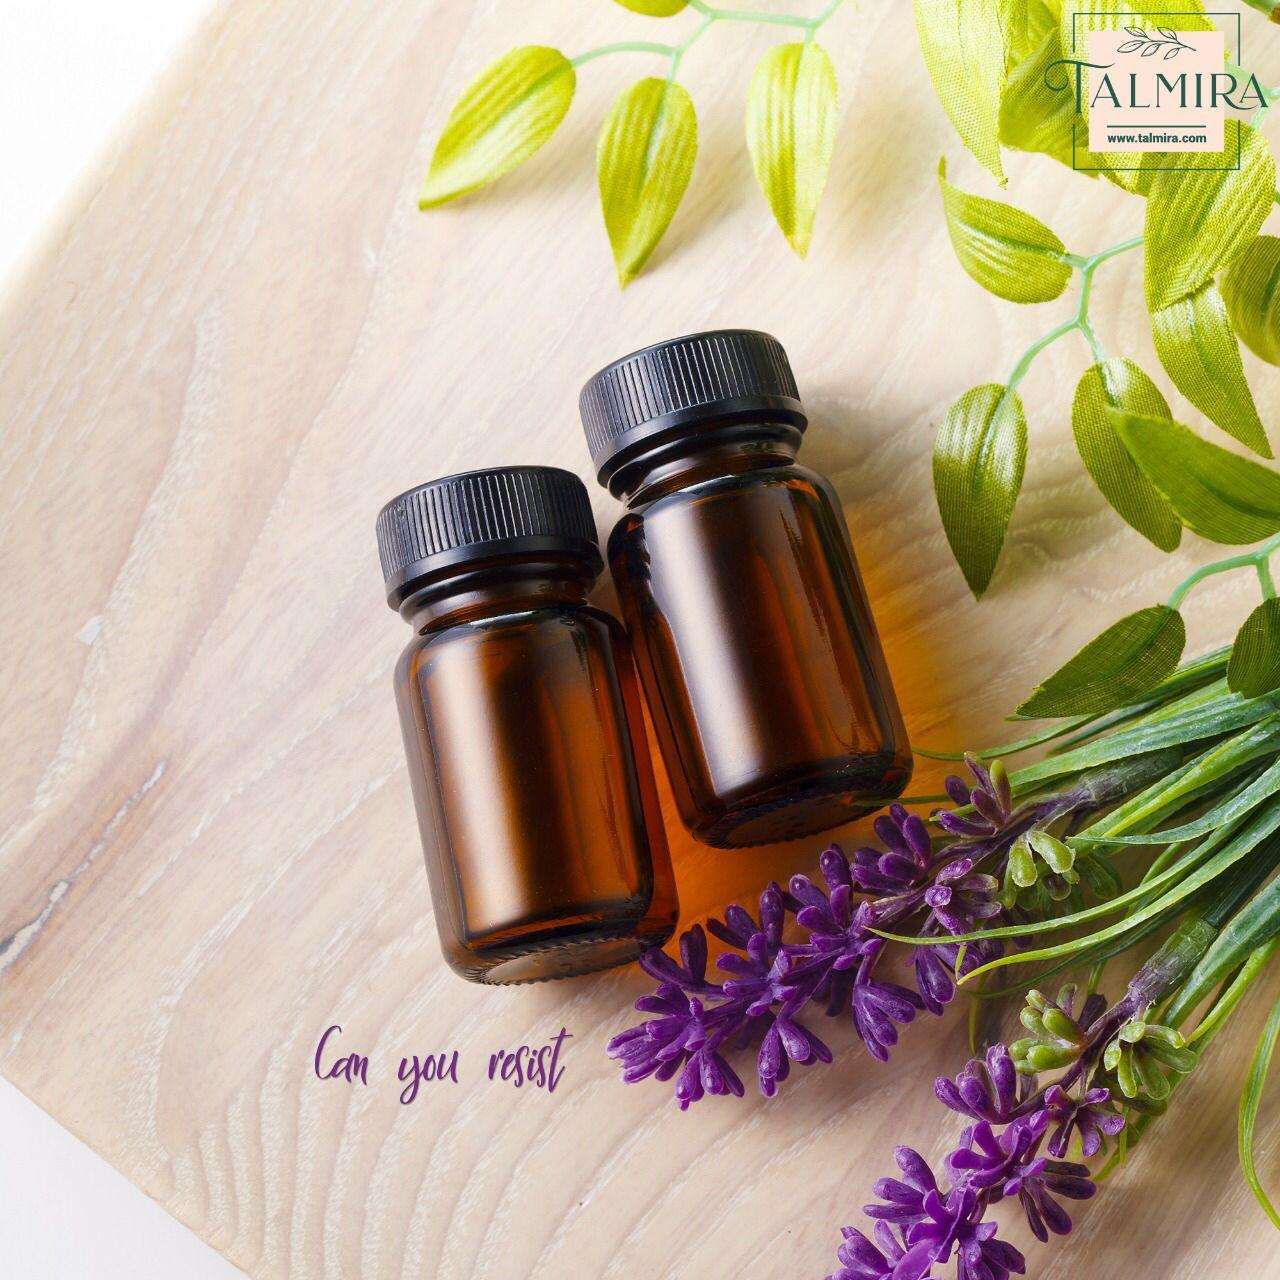 Can You Resist? Talmira Perfumes. Coming soon near you